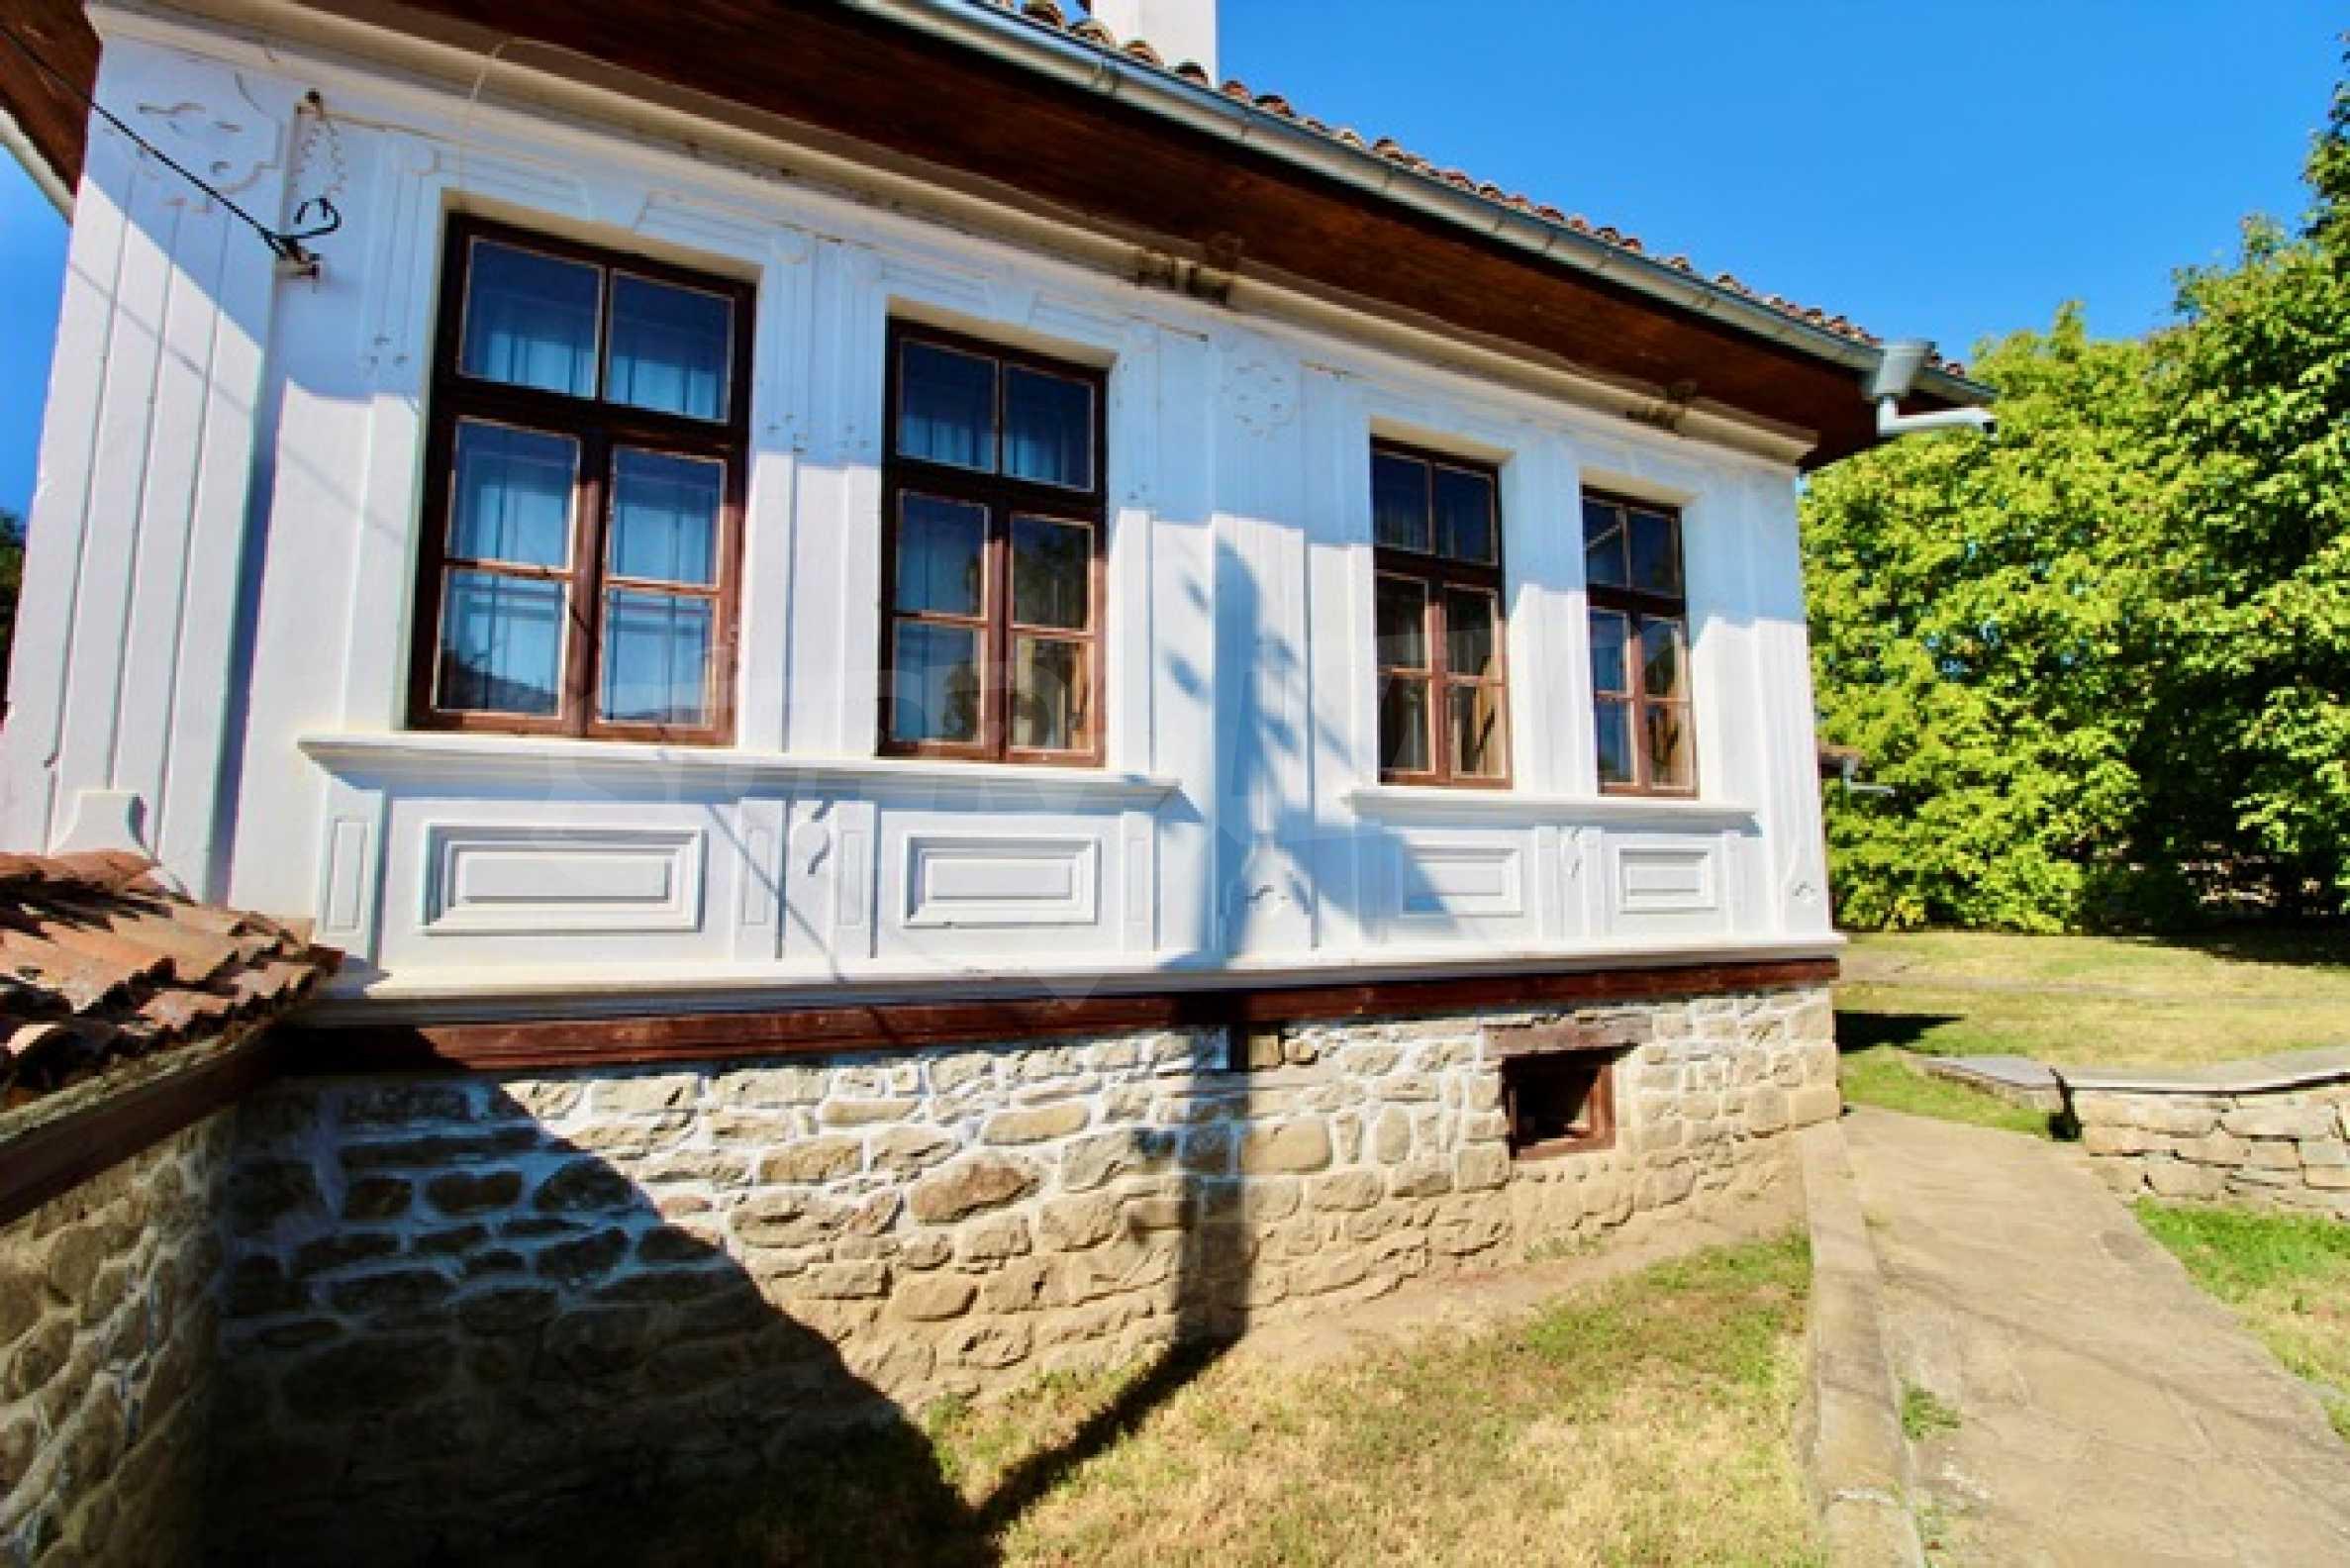 Lovely old house just 17 km away from Veliko Tarnovo 1